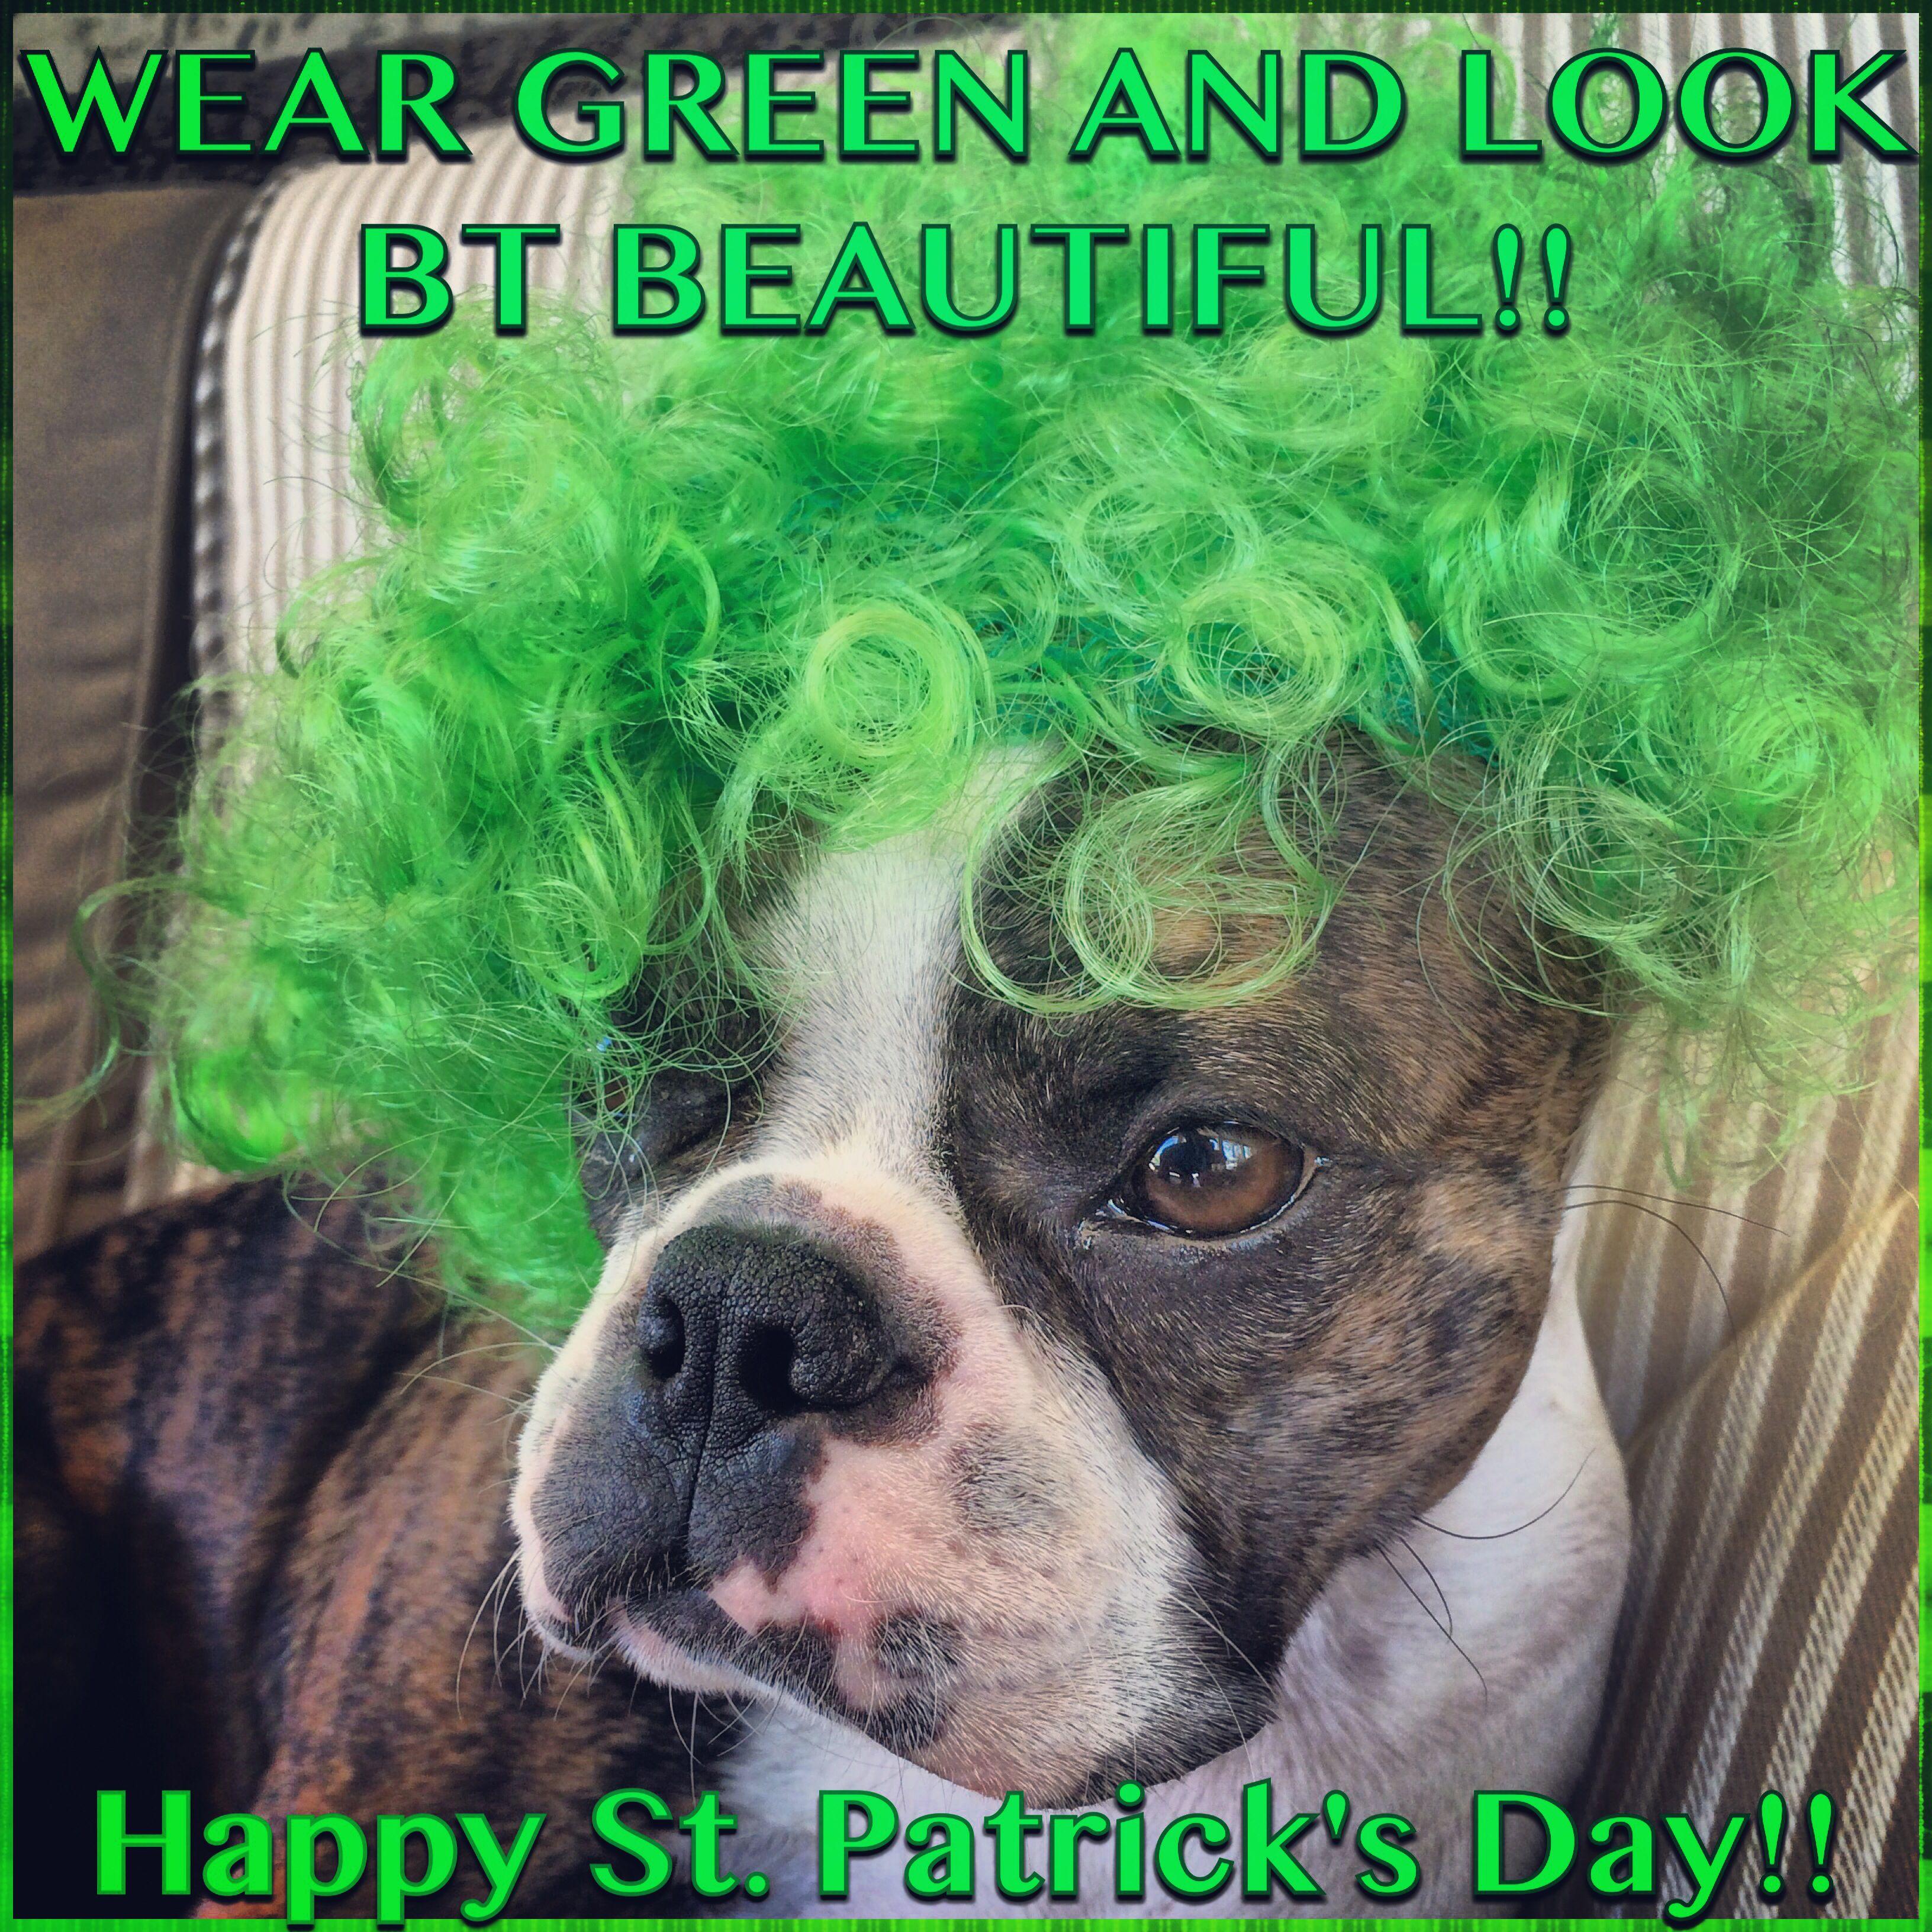 Boston Terrier Beauty On St Patrick S Day A Meme For The Green Boston Terrier Funny Boston Terrier Boston Terrier Dog